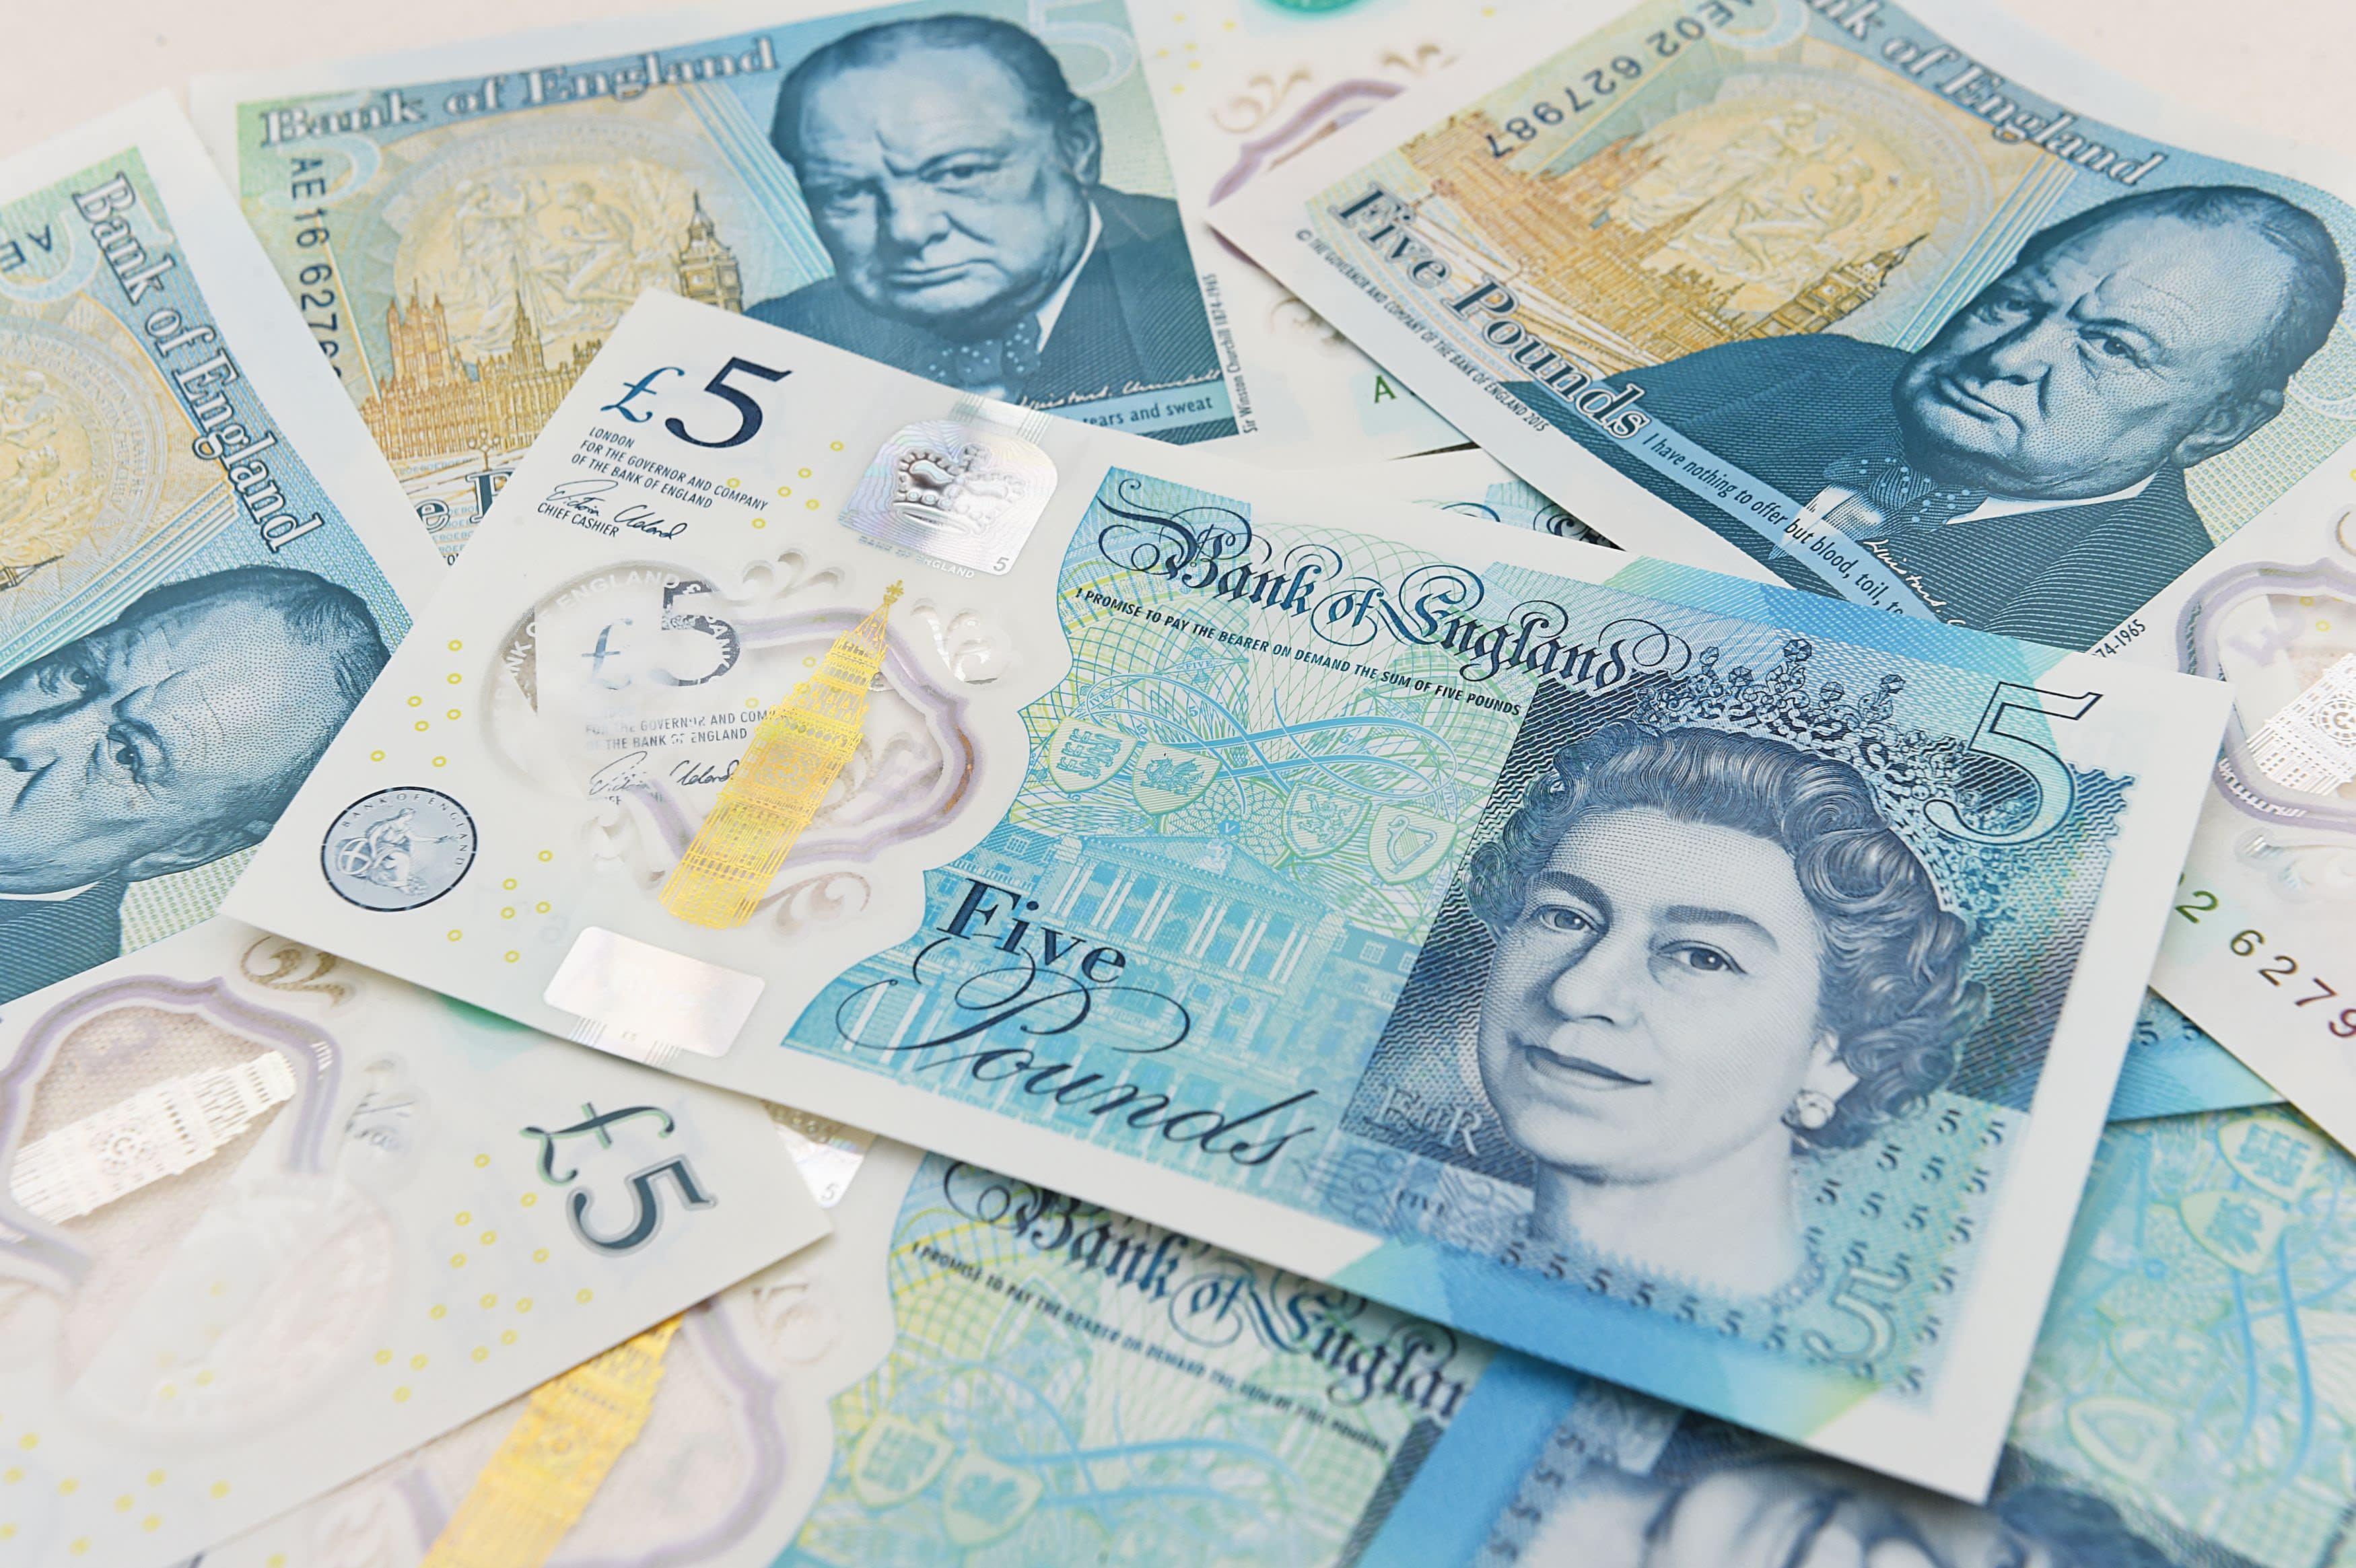 Drawdown cash withdrawals set to surge